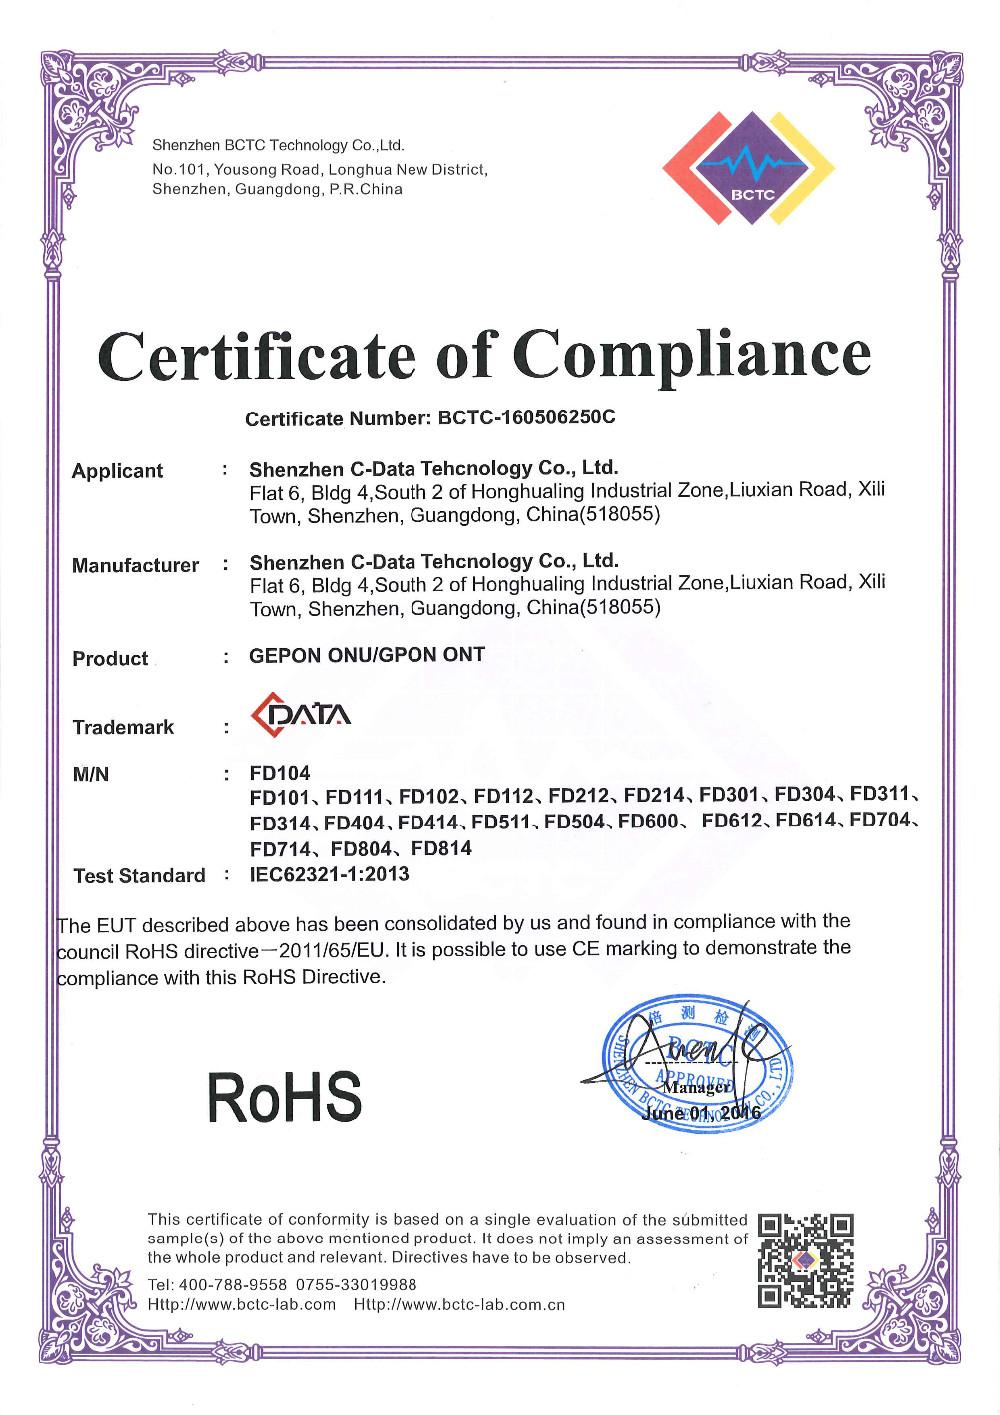 GEPON, GPON ONU ROHS Certificate.jpg